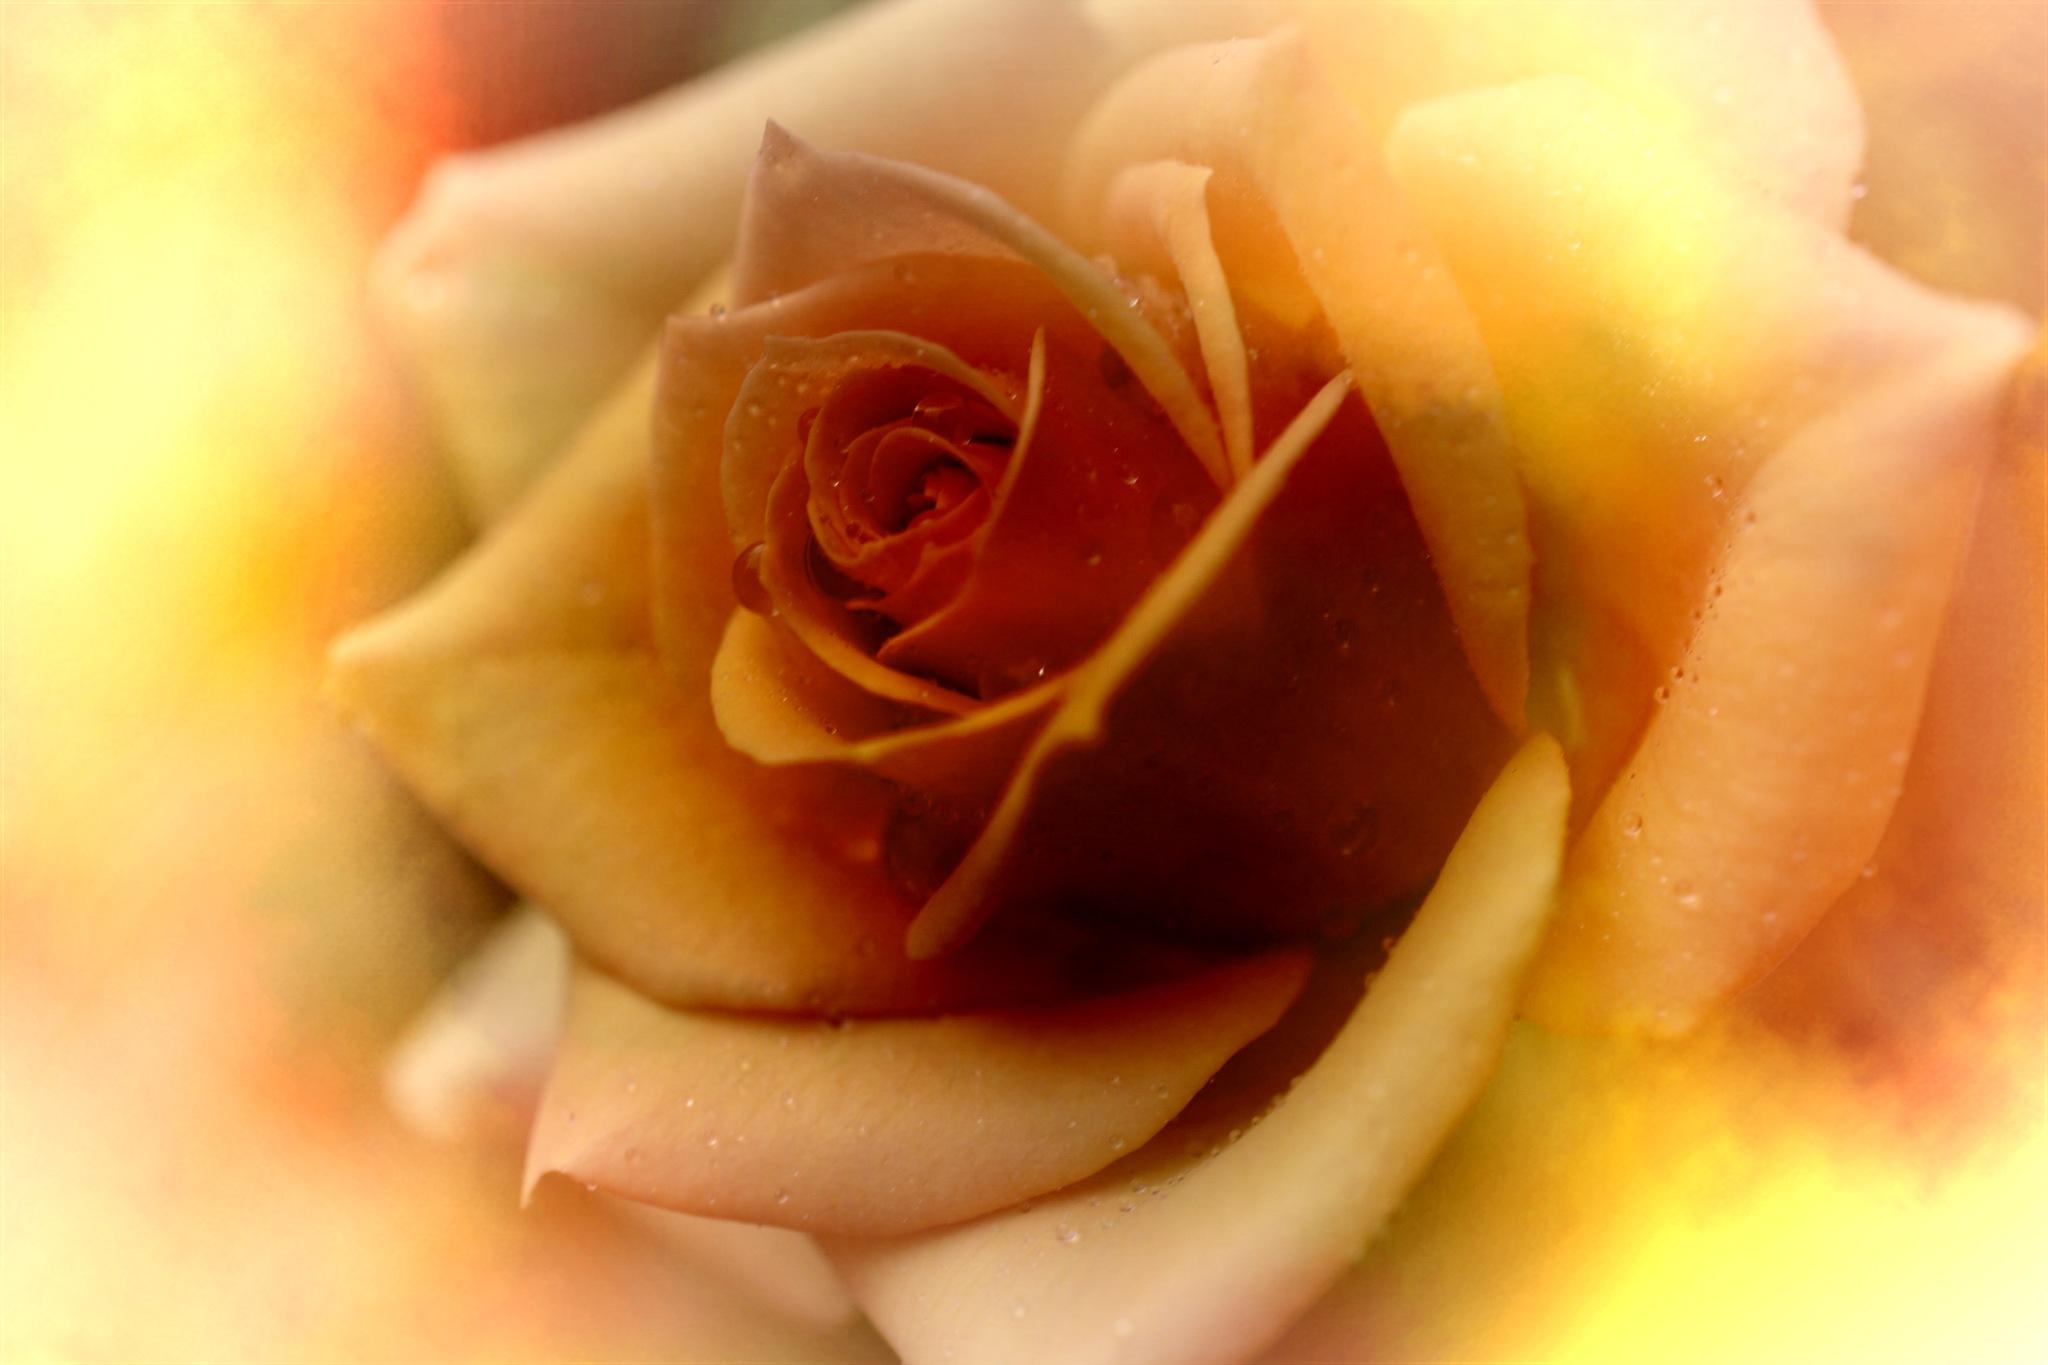 foggy rose by pgavin5000